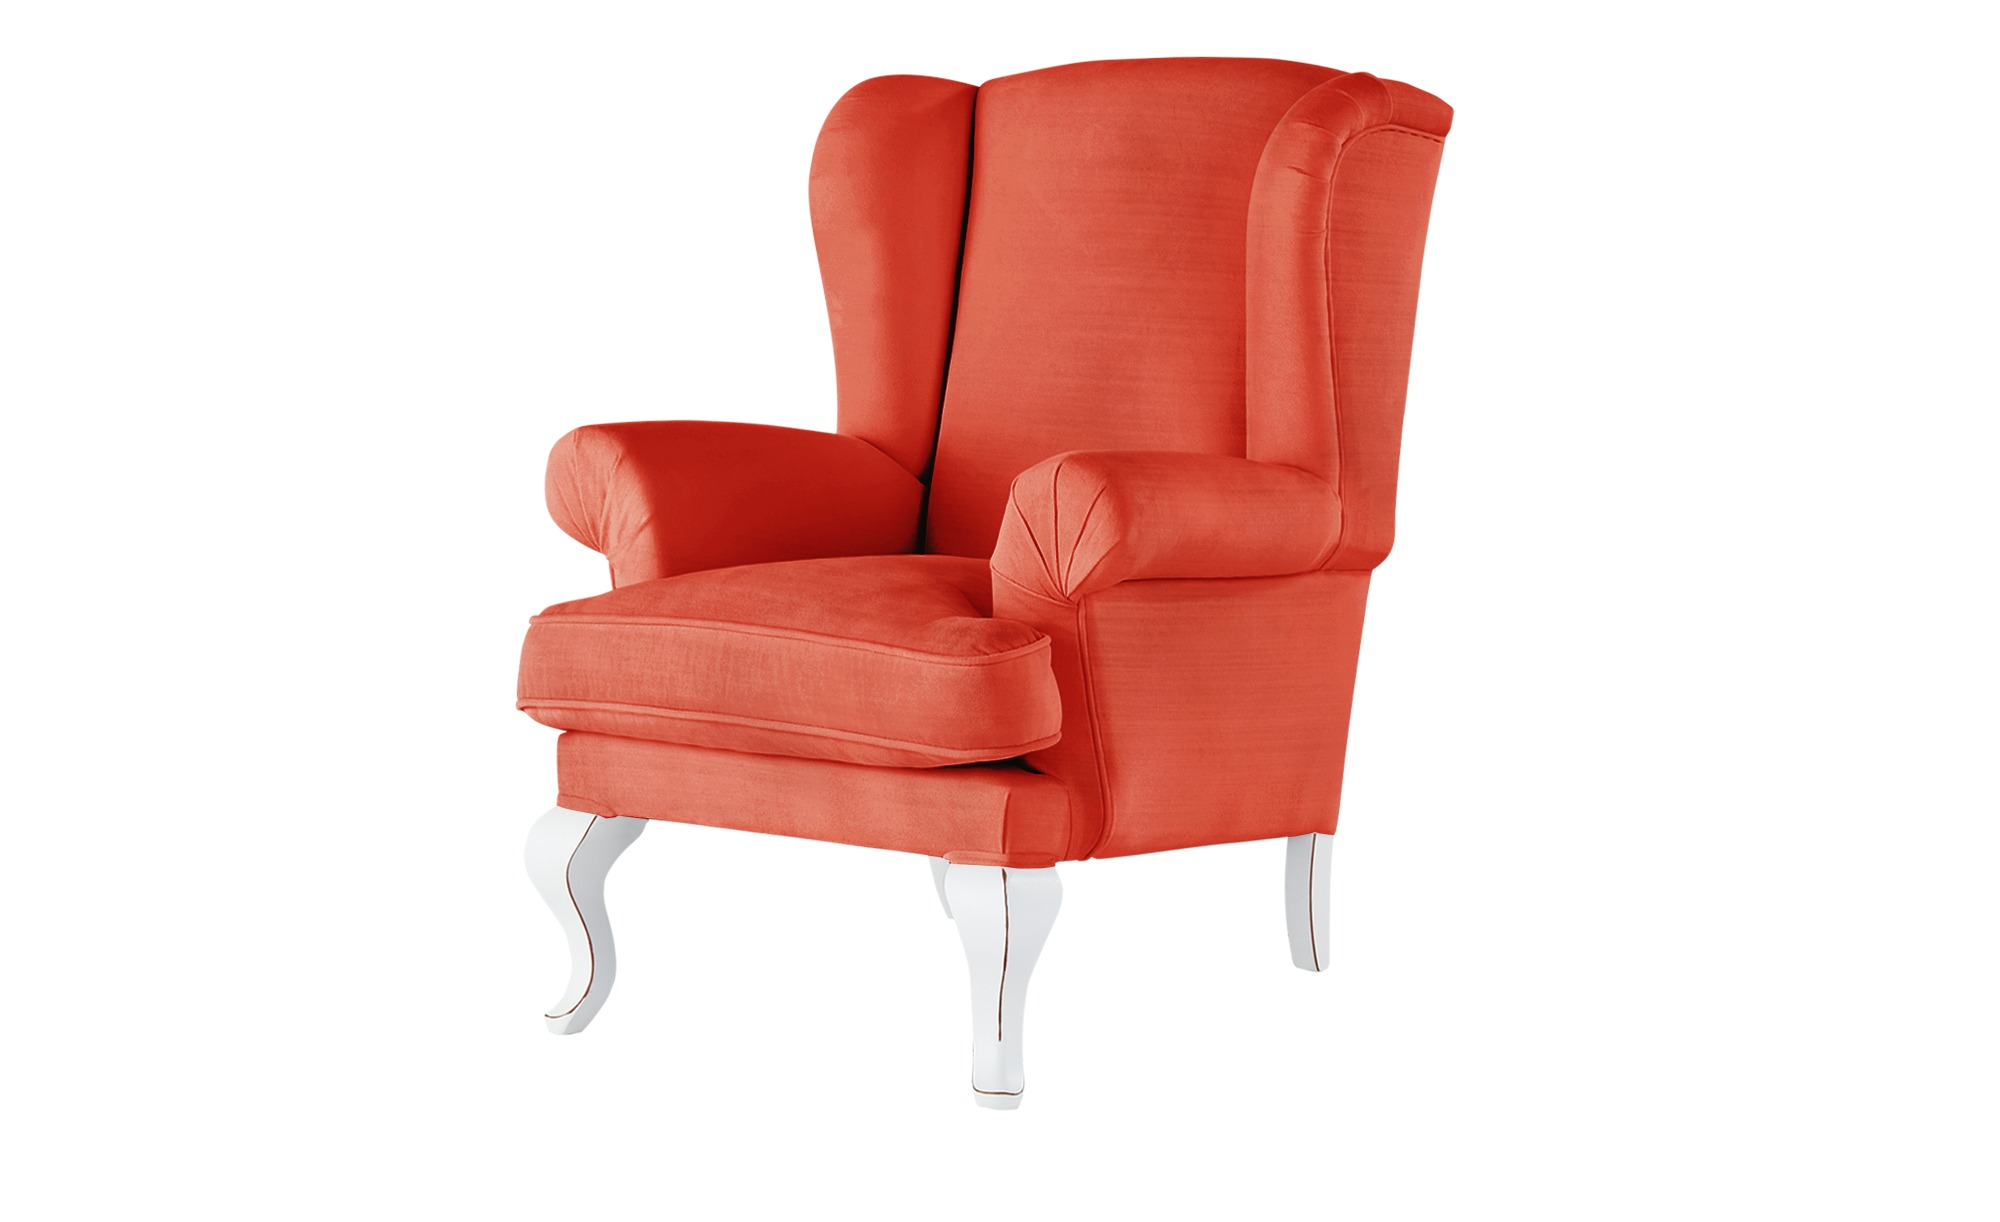 smart Ohrensessel orange - Stoff Charmaine ¦ orange ¦ Maße (cm): B: 84 H: 98 T: 85 Polstermöbel > Sessel > Ohrensessel - Höffner